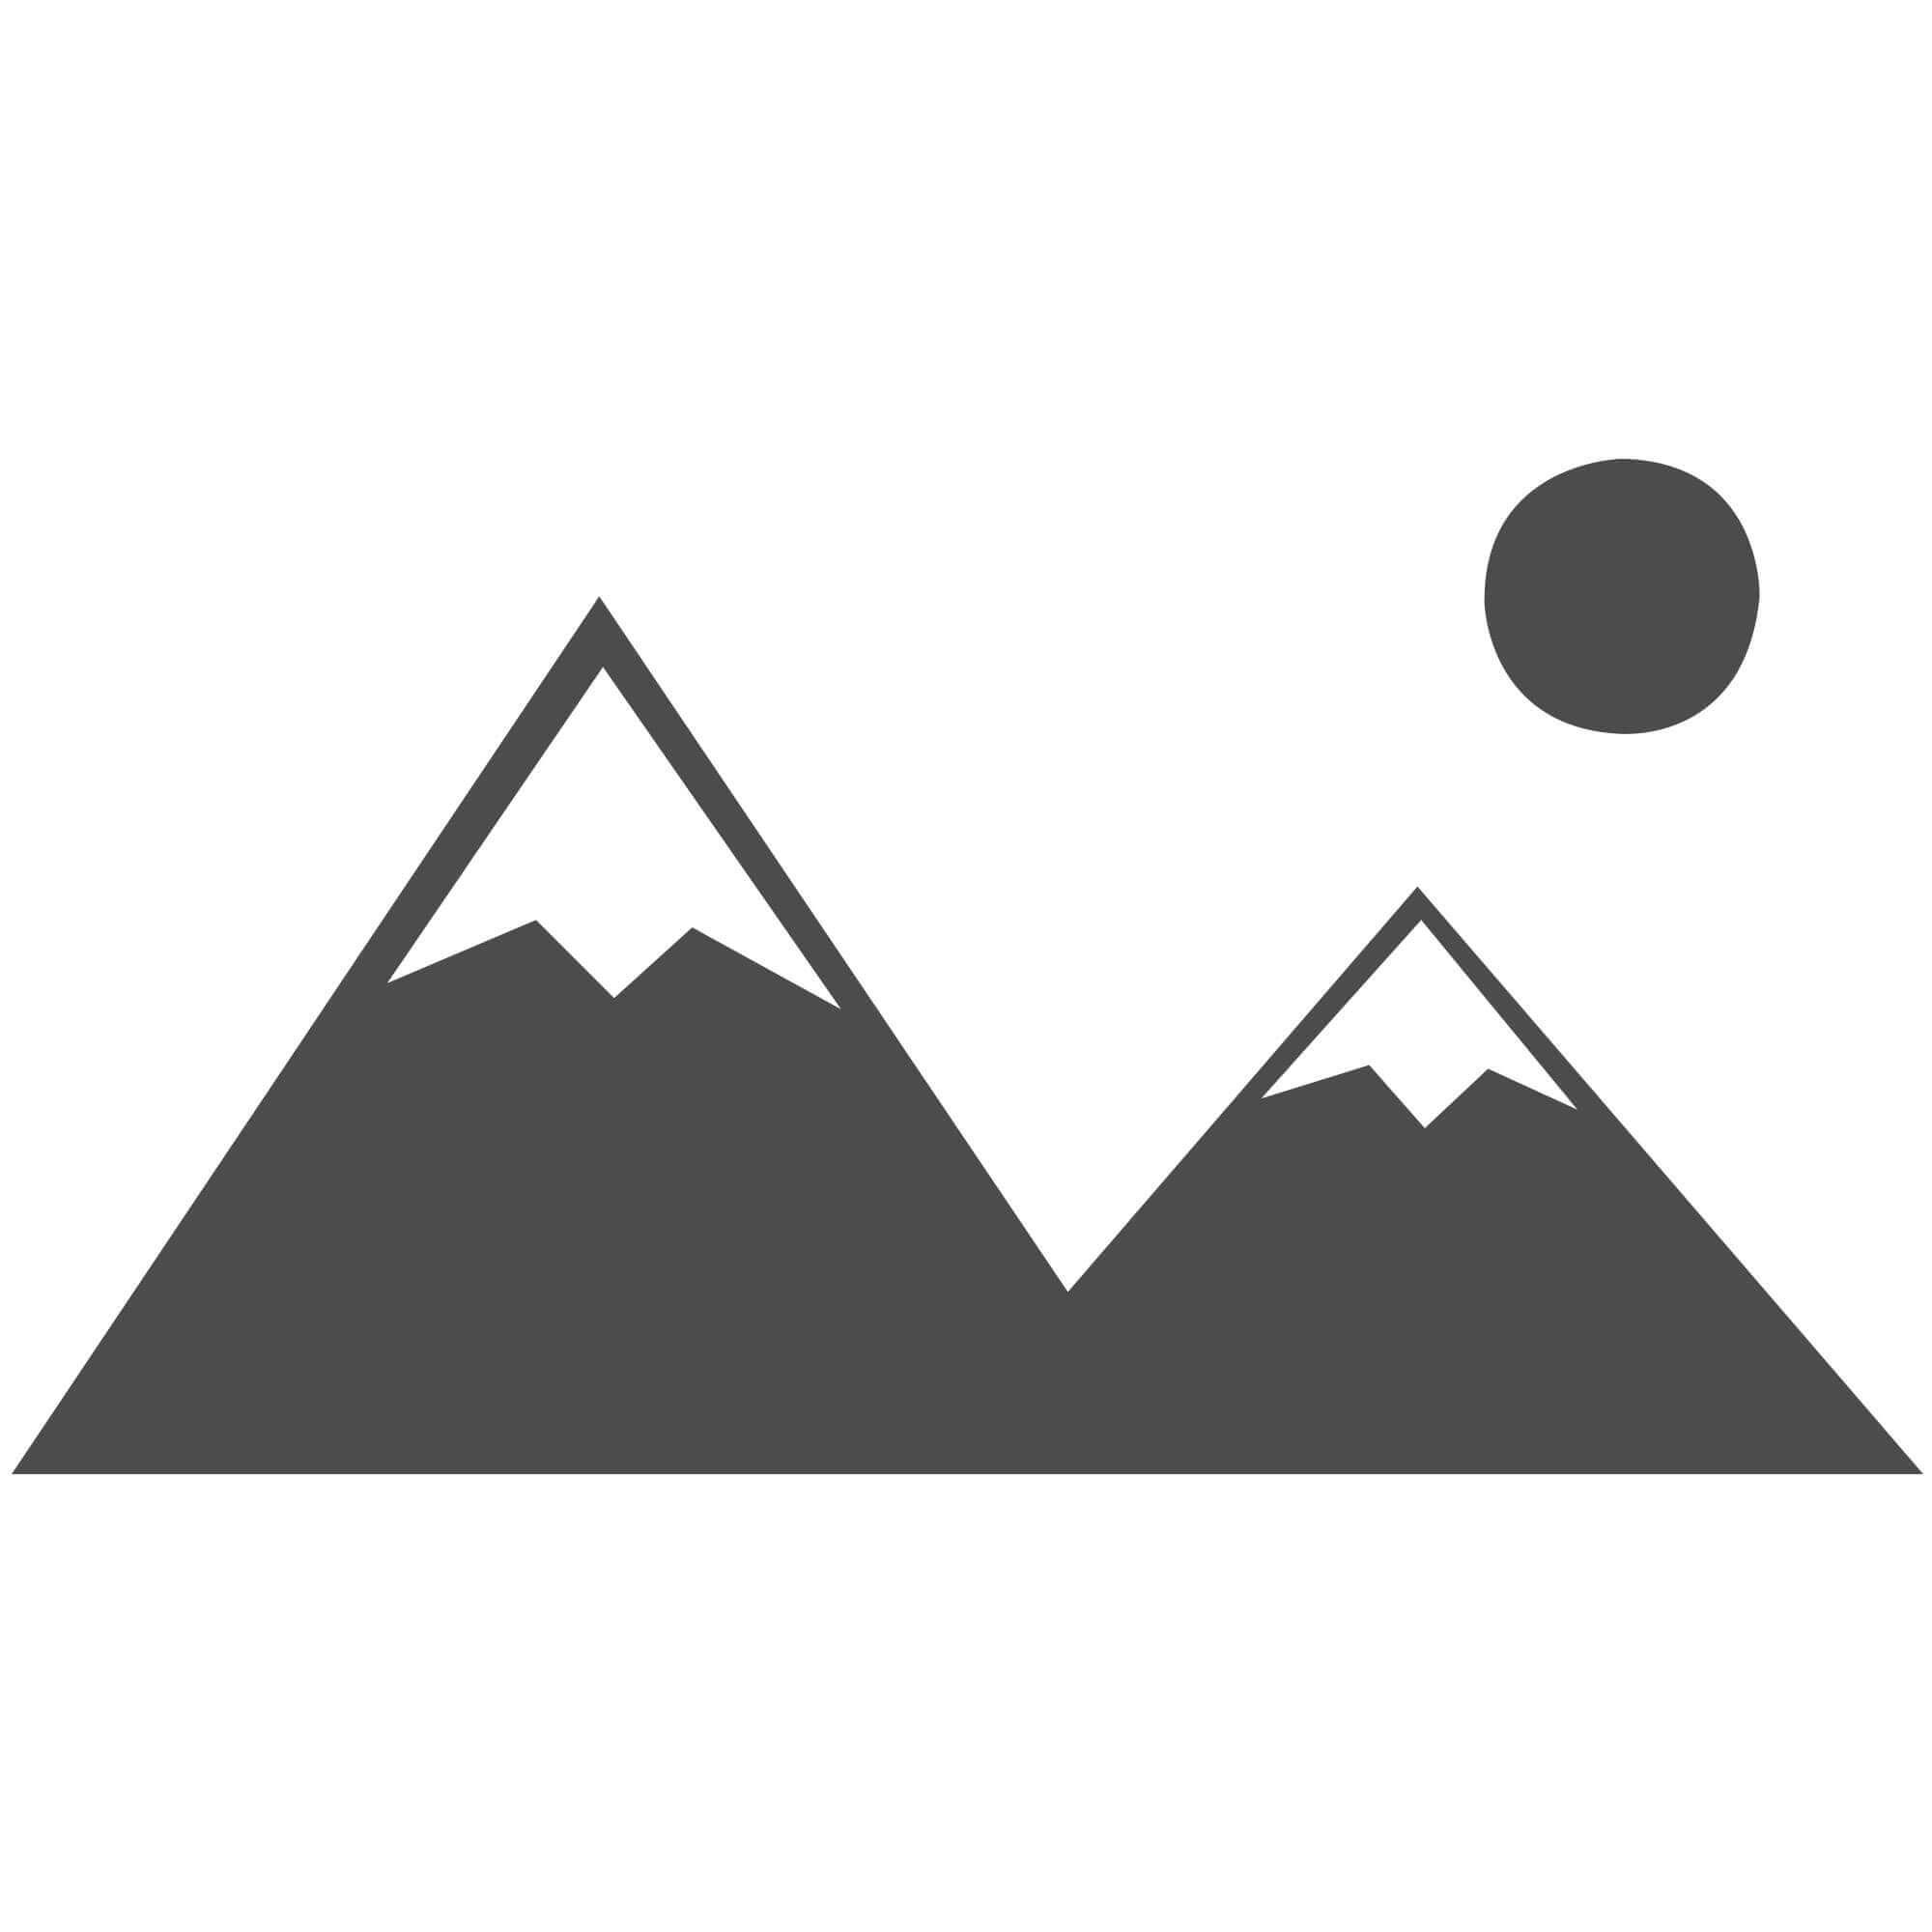 "Ziegler Traditional Persian Design Rug - 8788 Dark Blue-240 x 340 cm (7'10"" x 11'2"")"